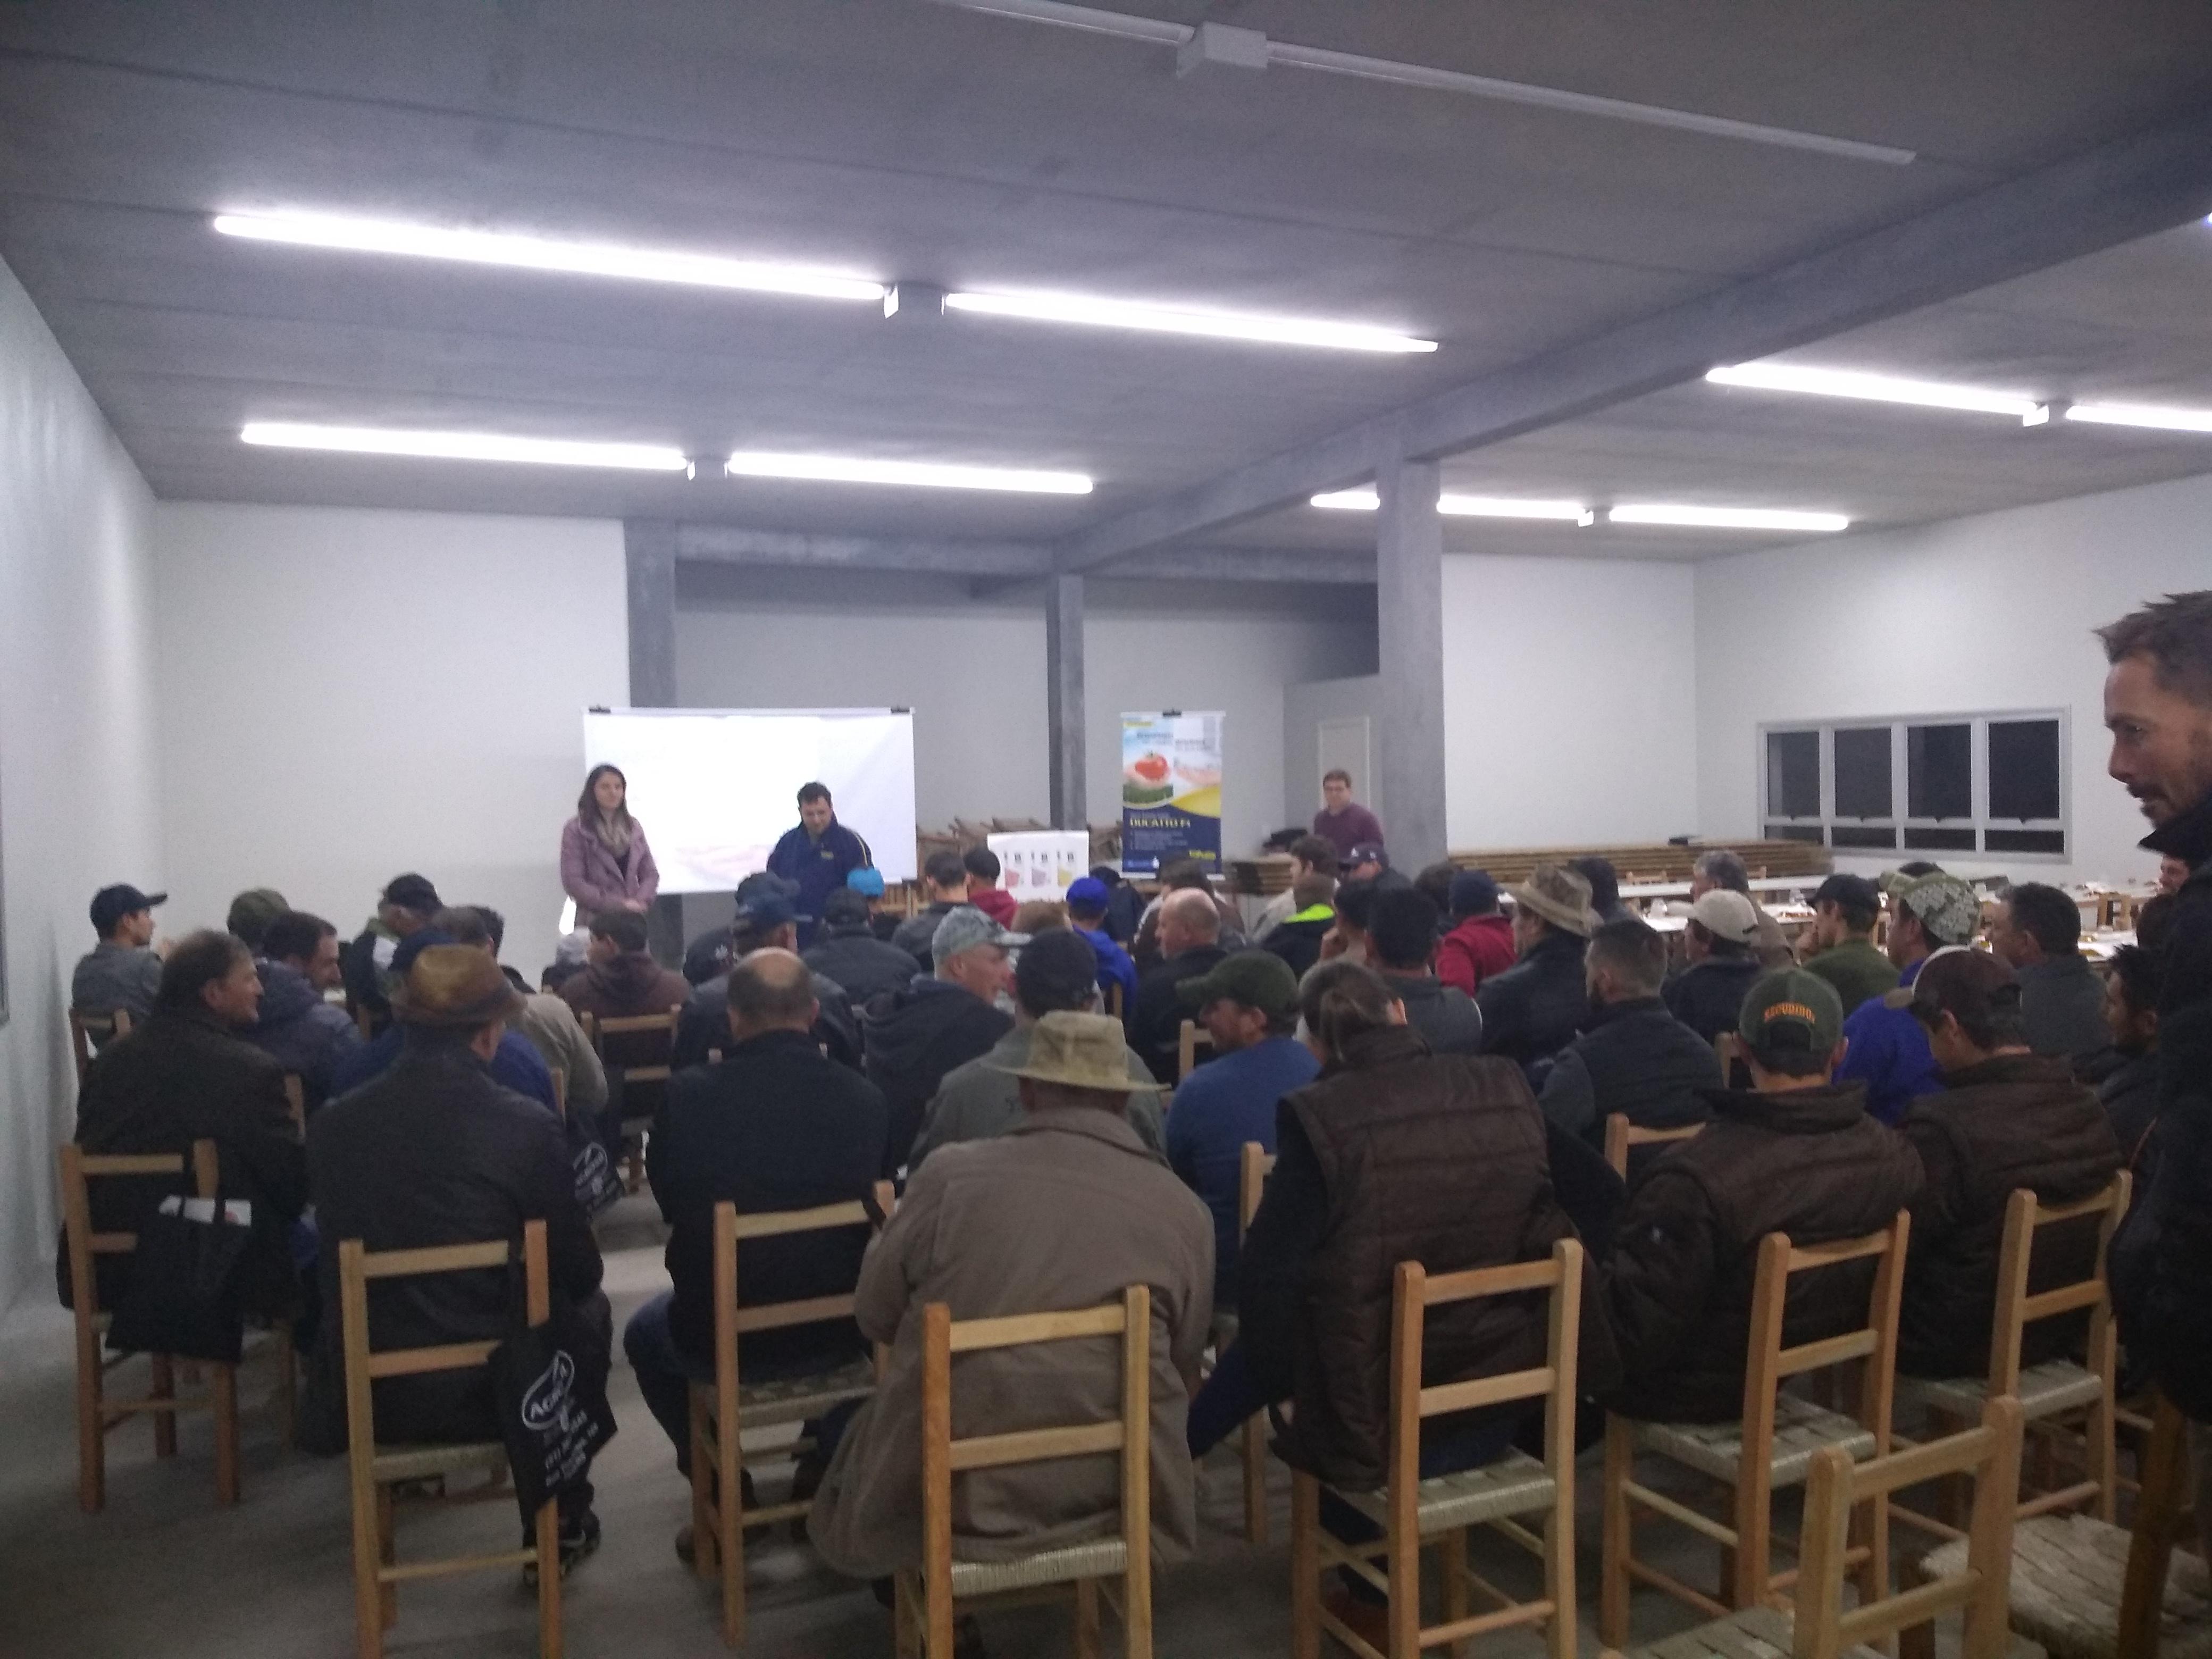 Agrosul e Topseed Premium promovem palestra em Santa Lúcia do Piaí (RS)